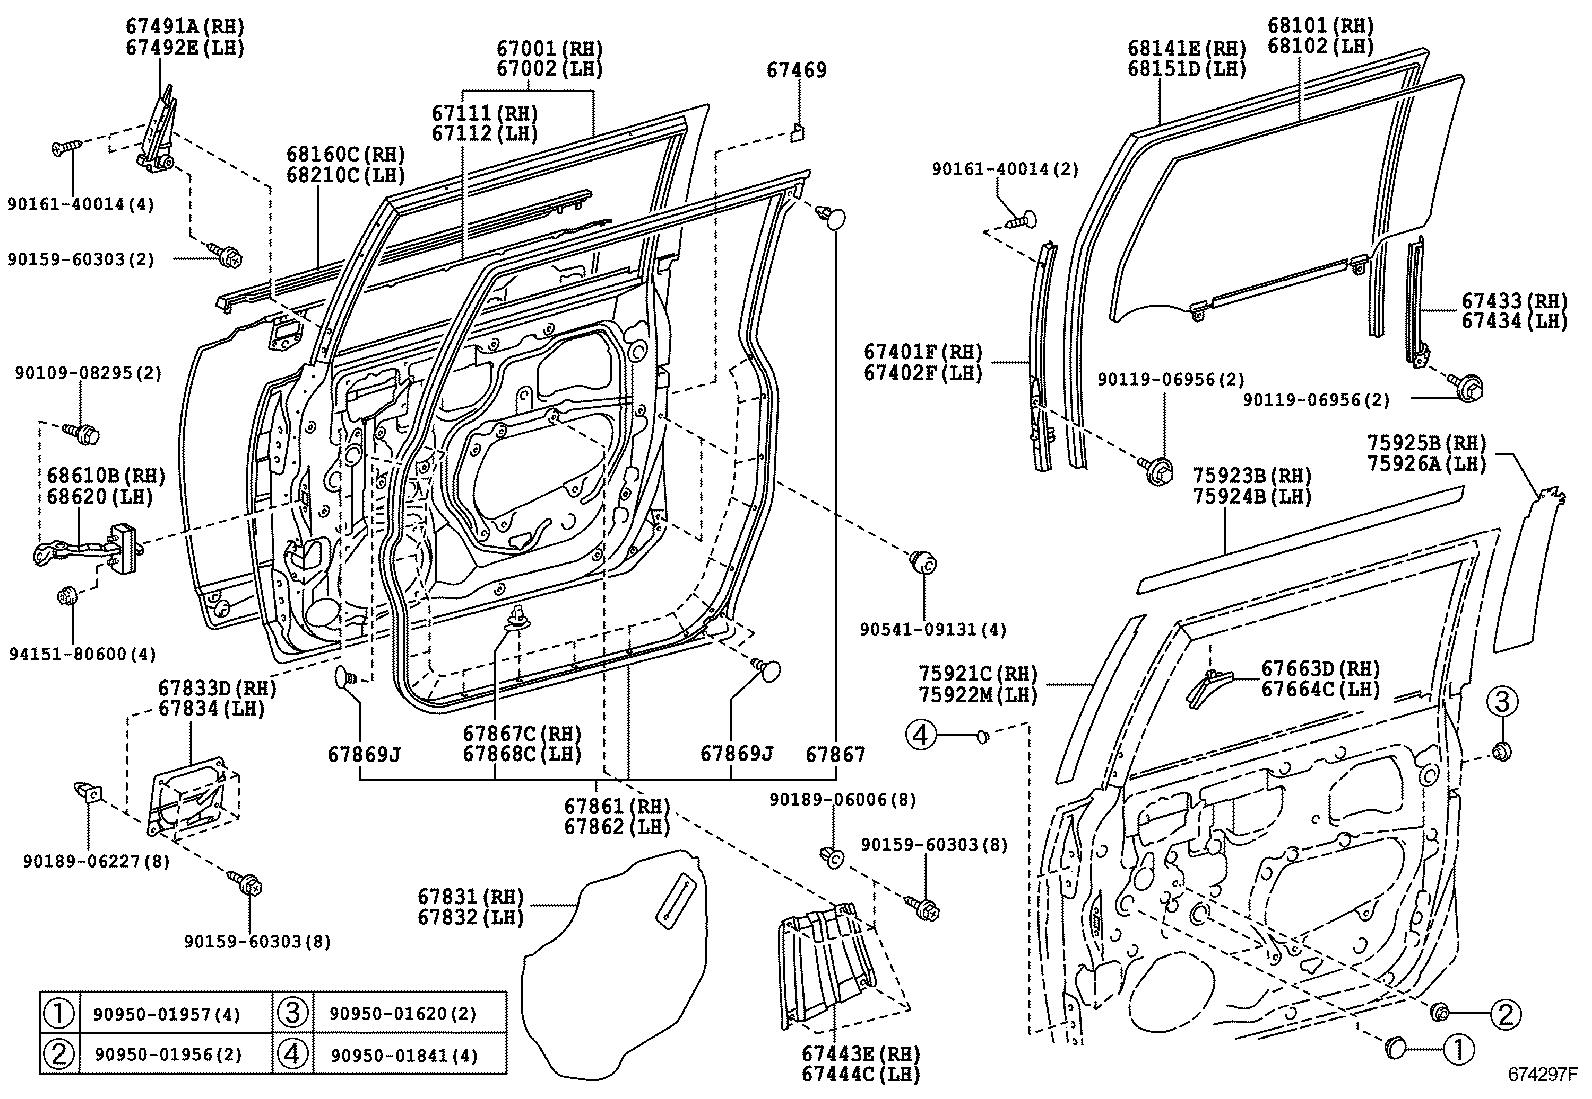 Toyota Fj Cruiser Body Diagram Electrical Wiring Diagrams 2007 Fuse Box Door Parts Auto U2022 Land